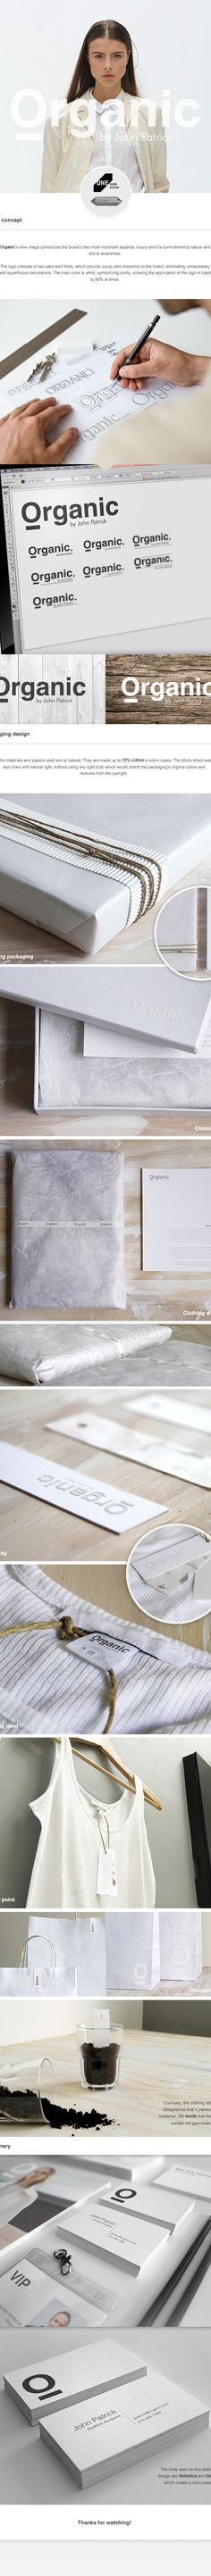 Organic by John Patrick - Packaging & Branding on Wacom Gallery